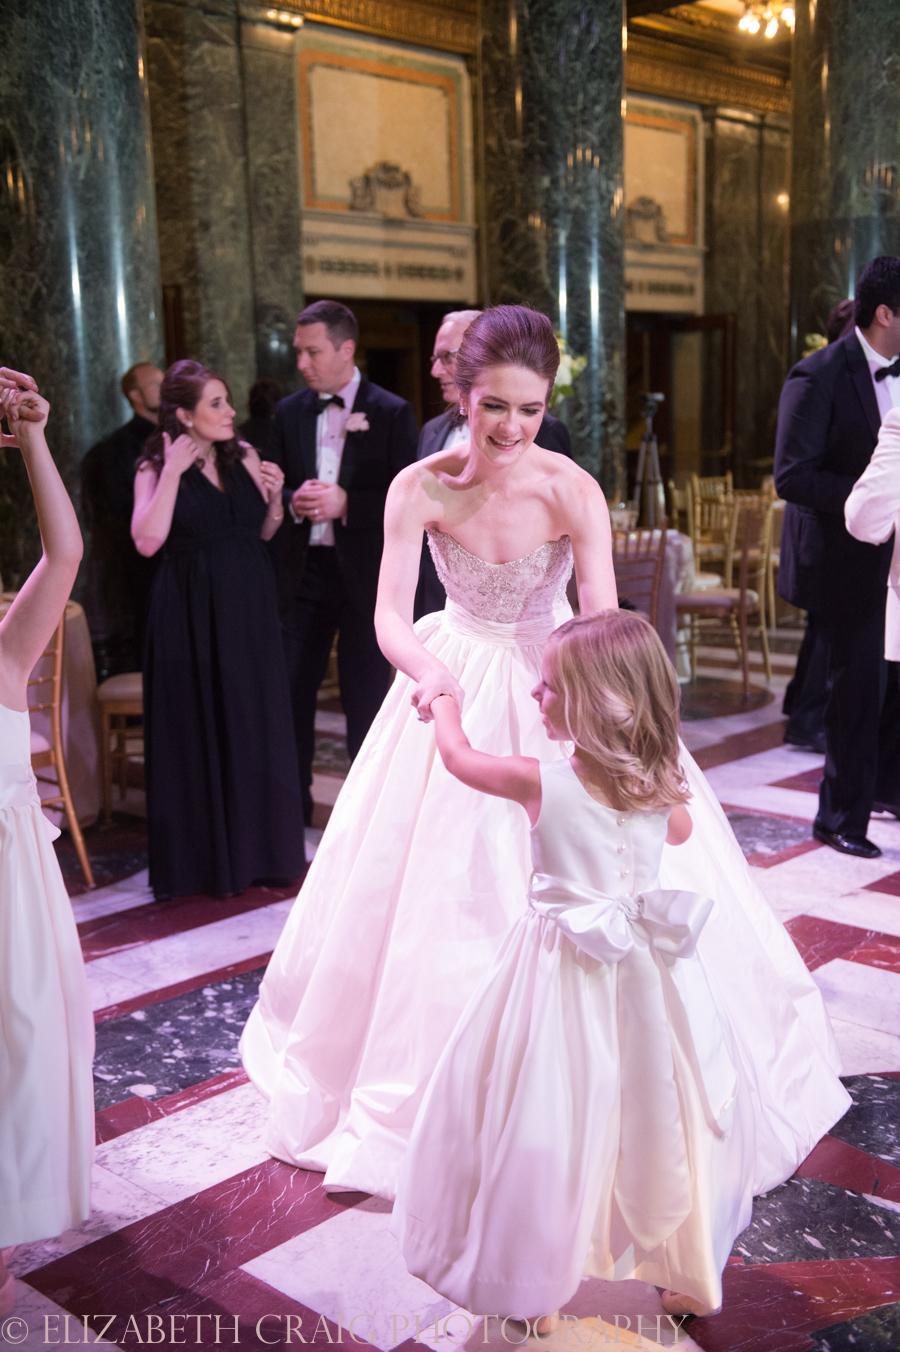 Carnegie Museum Music Hall Foyer Wedding Receptions-16